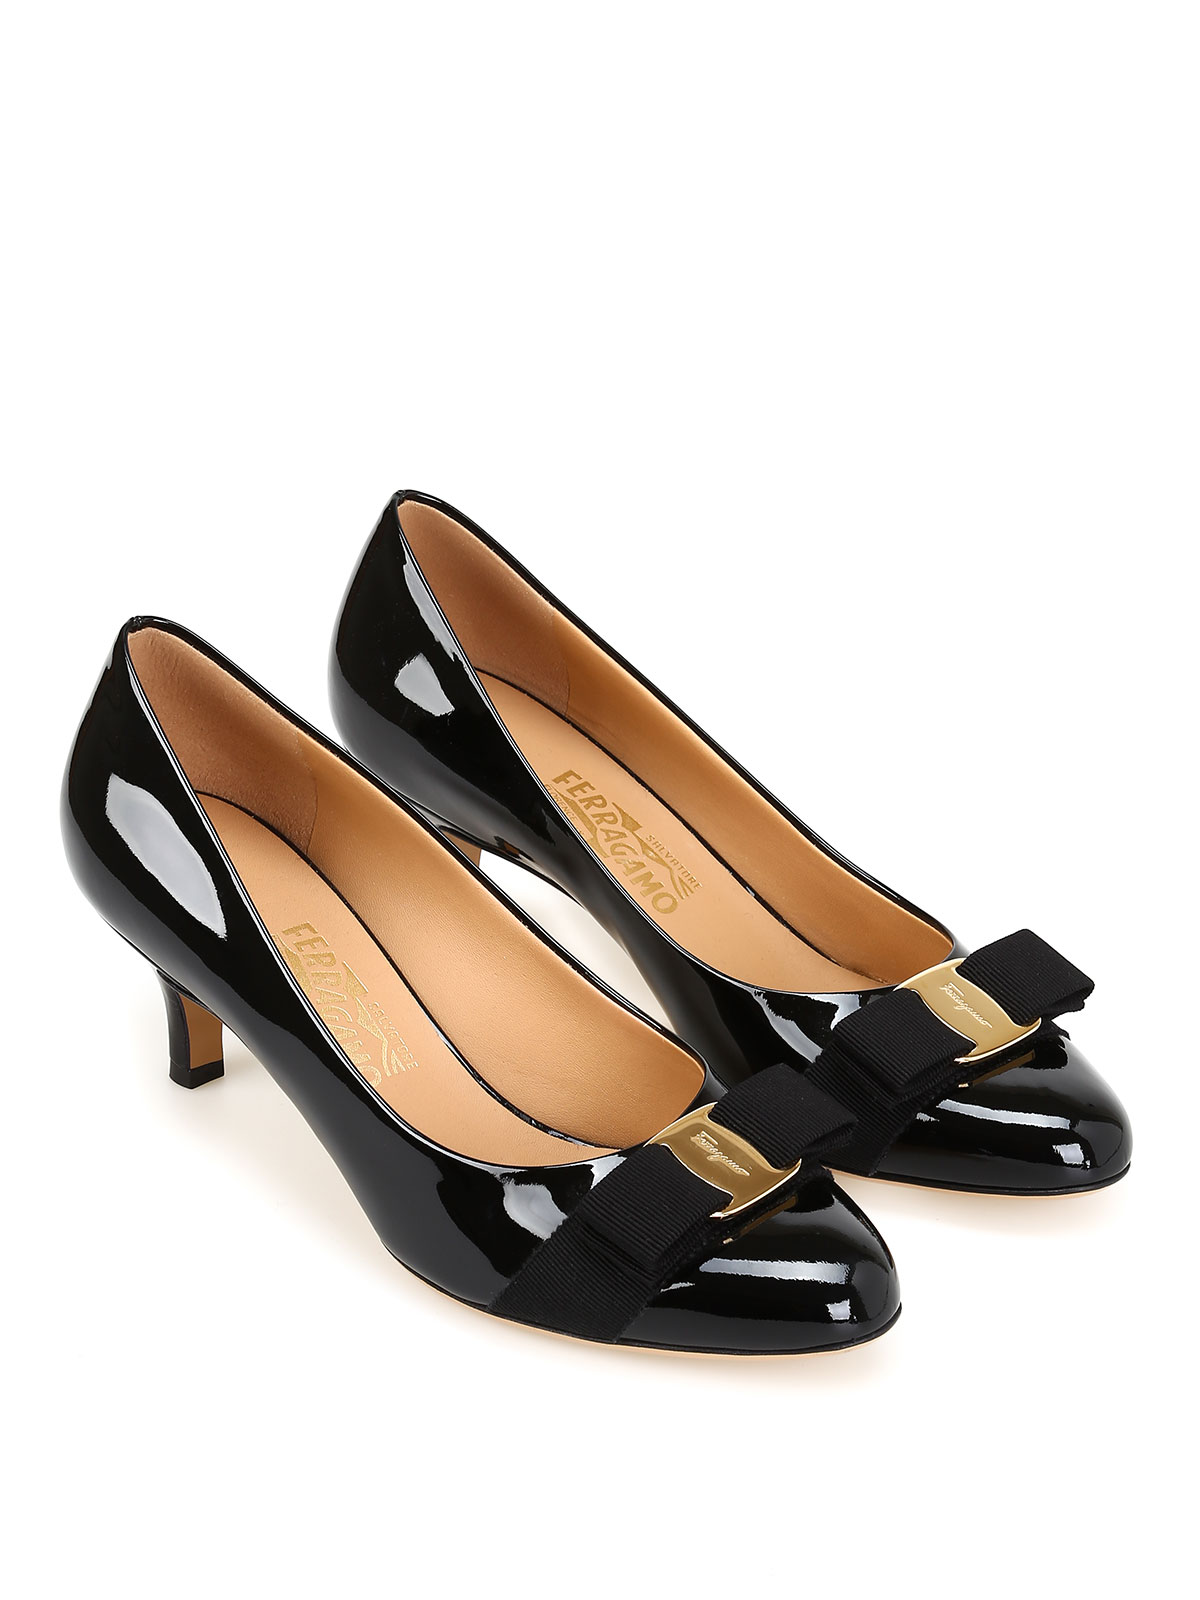 salvatore-ferragamo-flat-shoes-carla-55-patent-leather-pump-frg029196do000su71.jpg